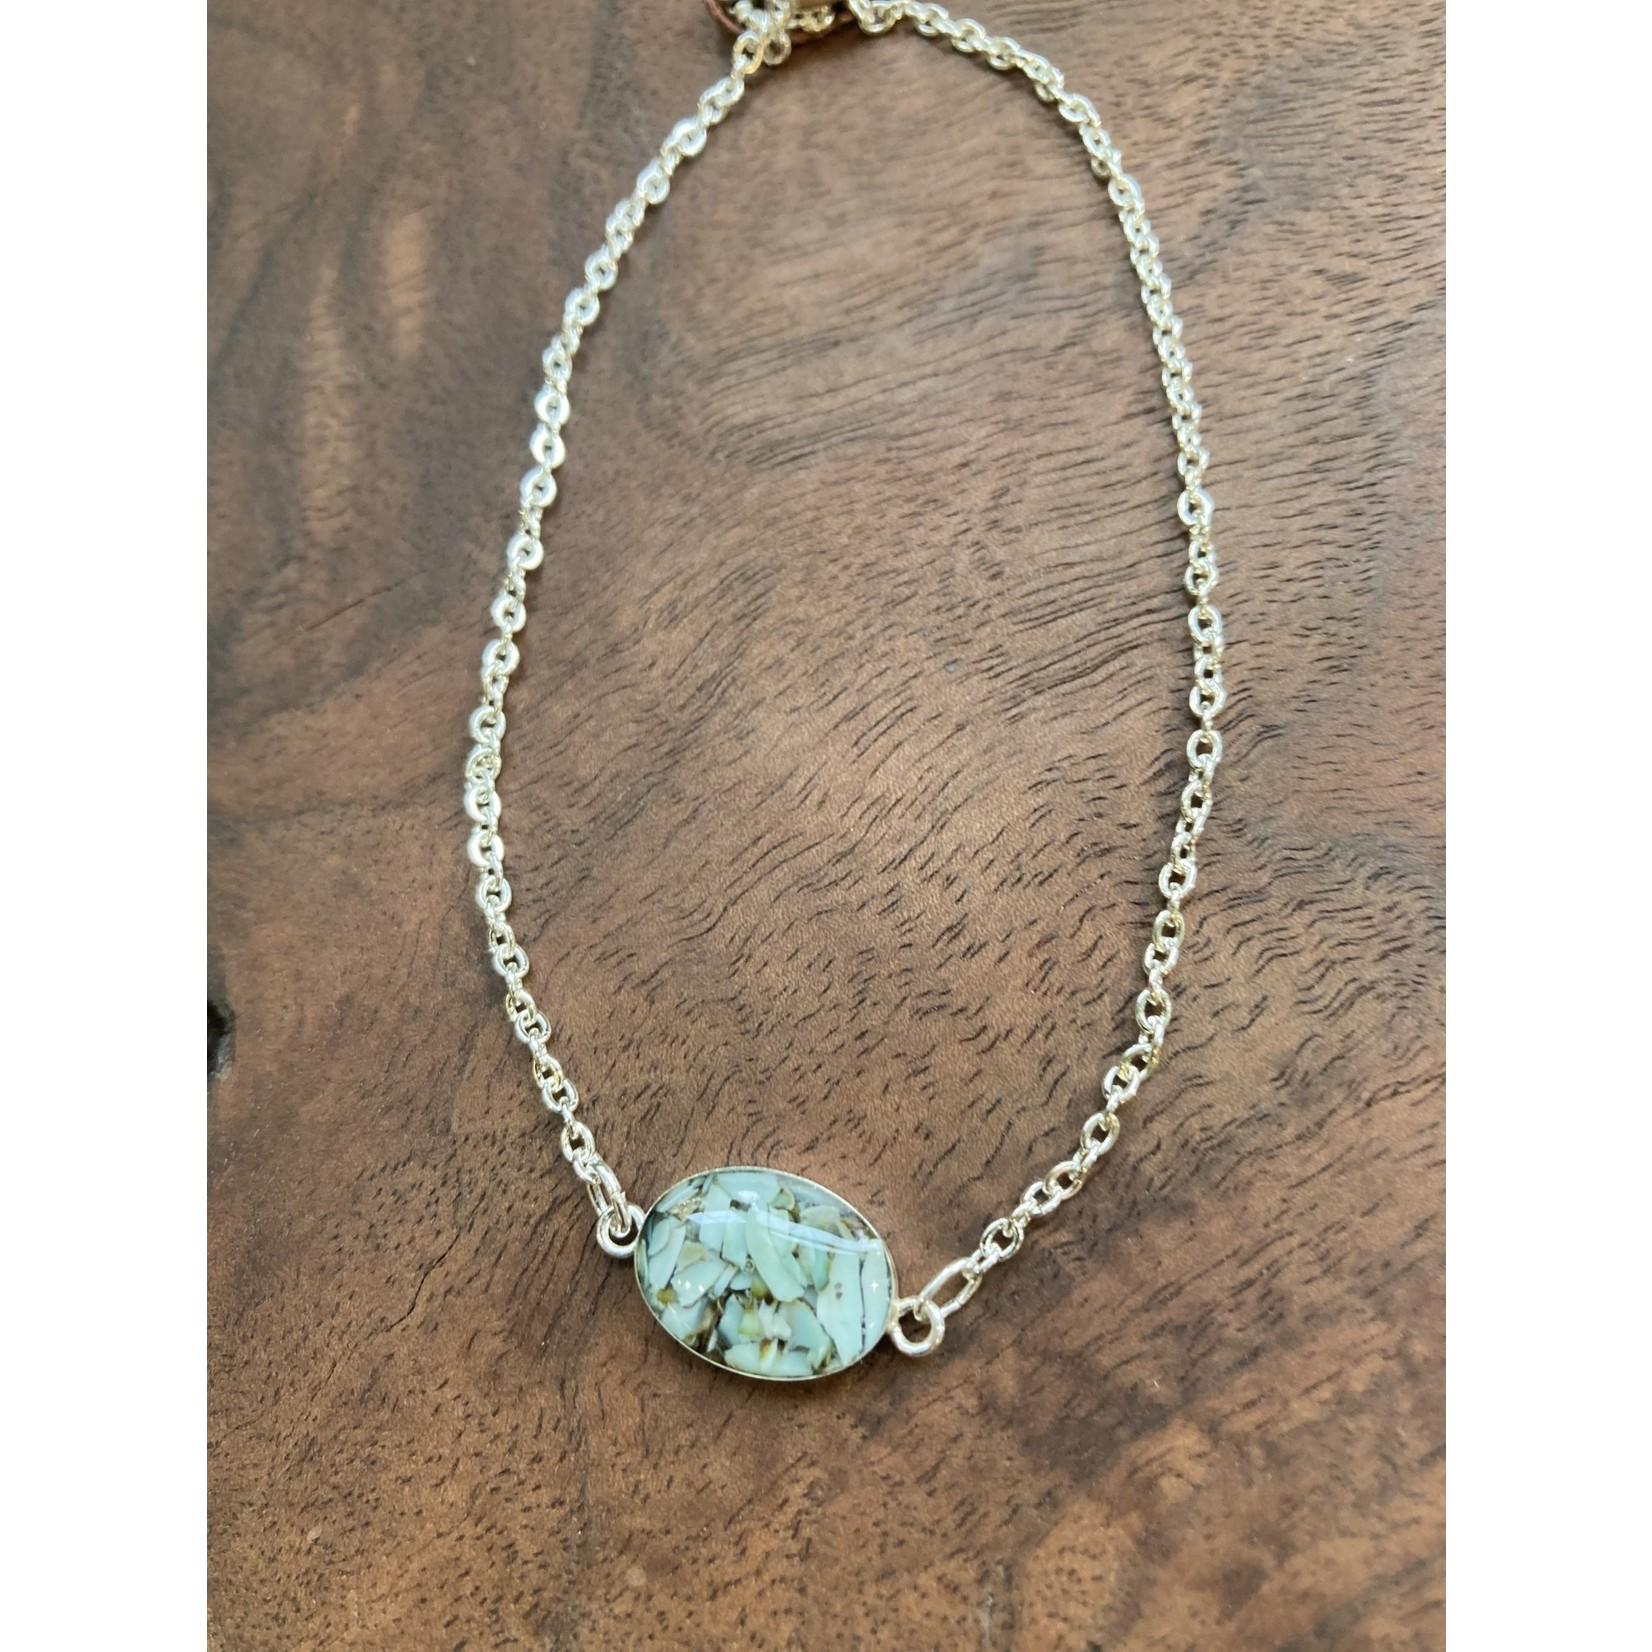 Colleen Hirsh Colleen Hirsh #117 SS limpett oval bracelet